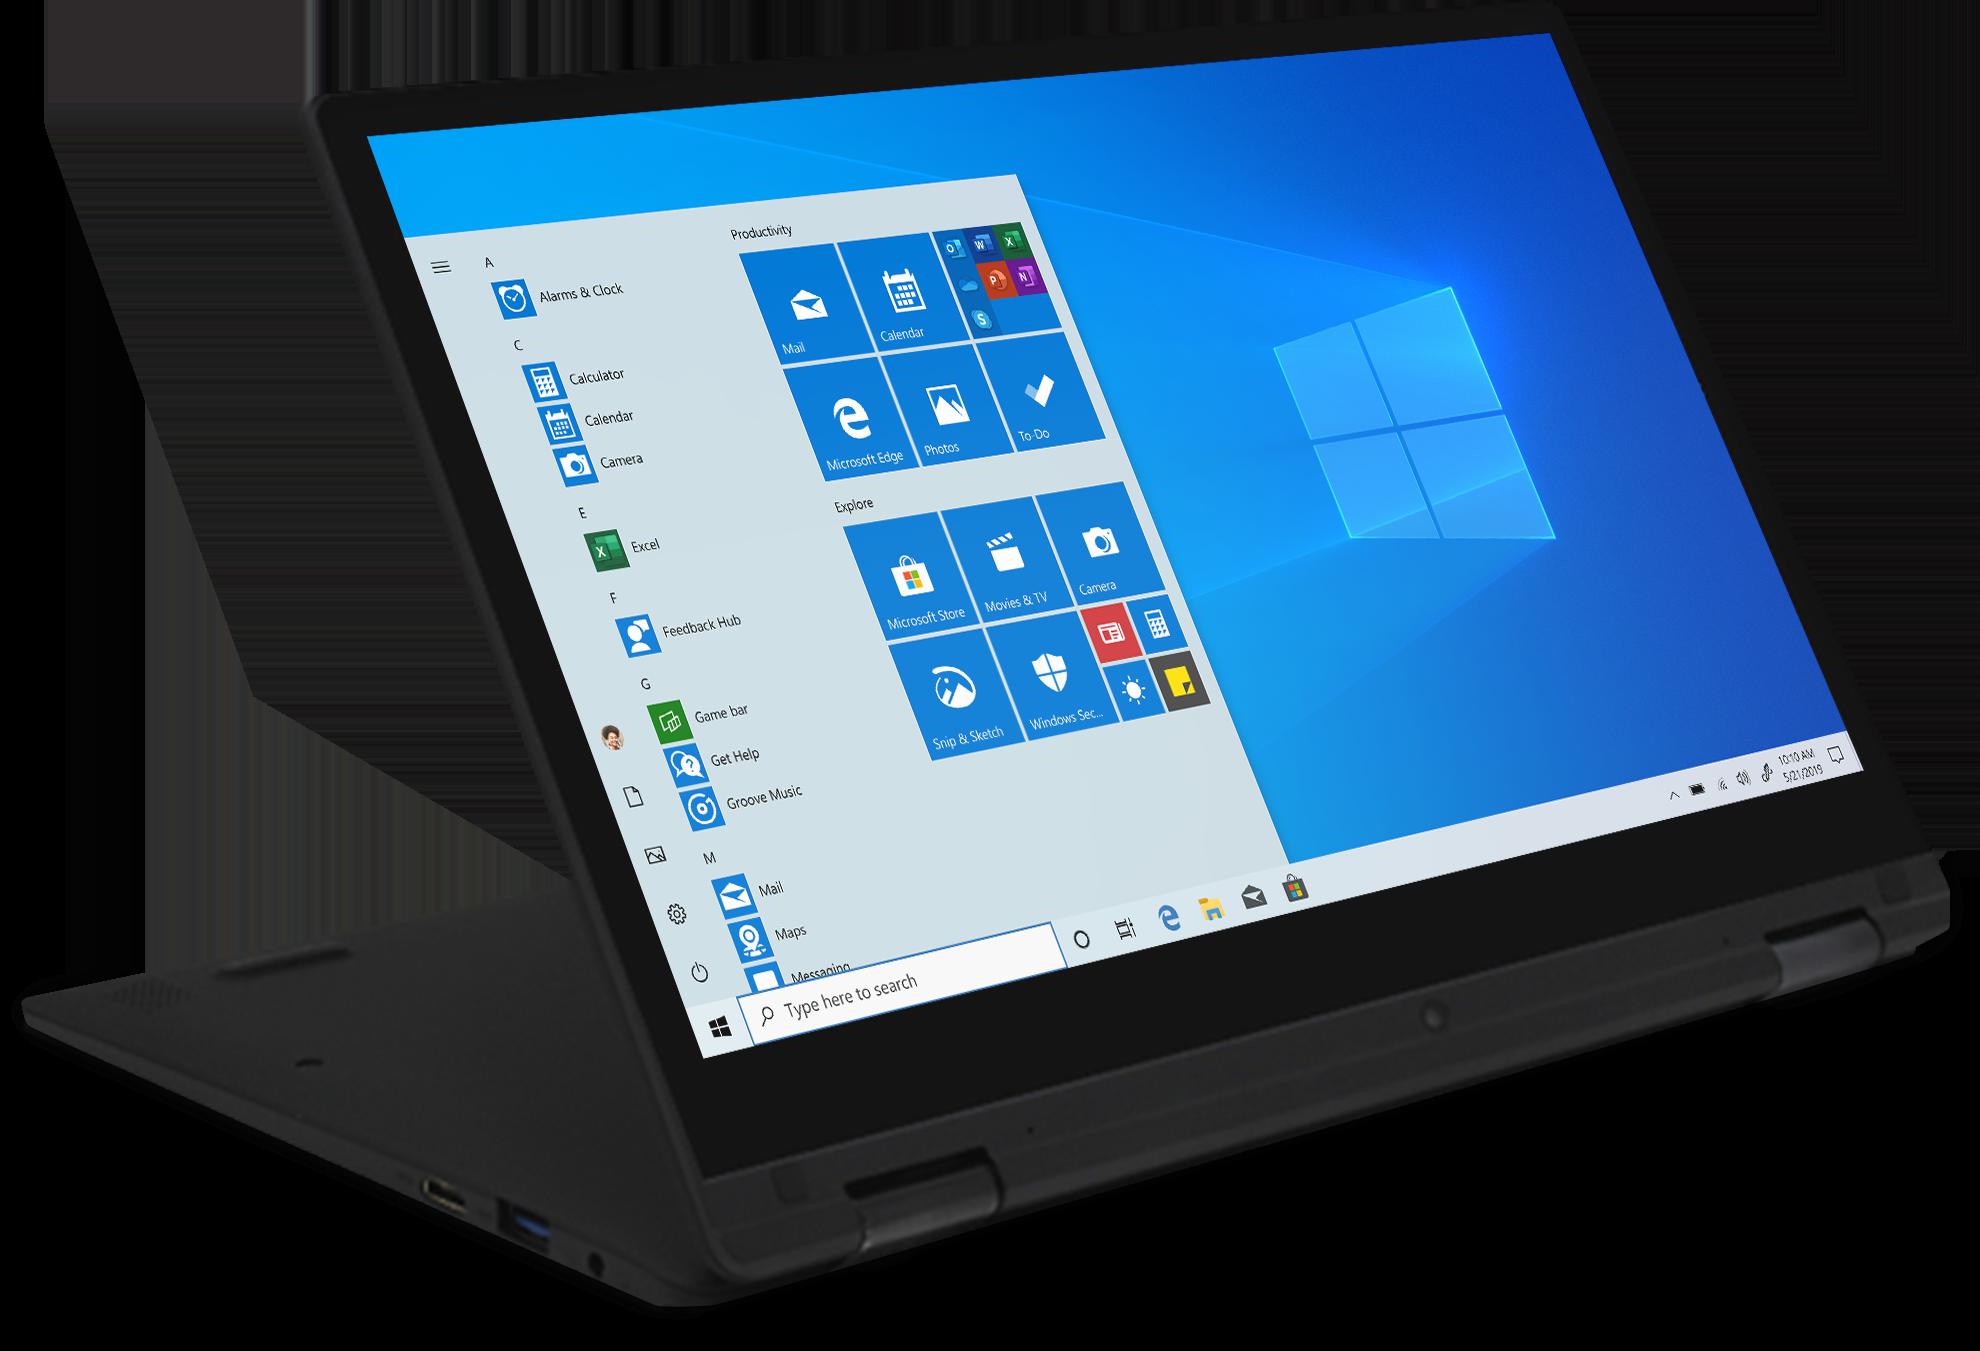 RE4oV6d?ver=3e39 - EVOO 13.3'' Convertible Touchscreen EV-L2in1-133-2-BK 2-in-1 PC